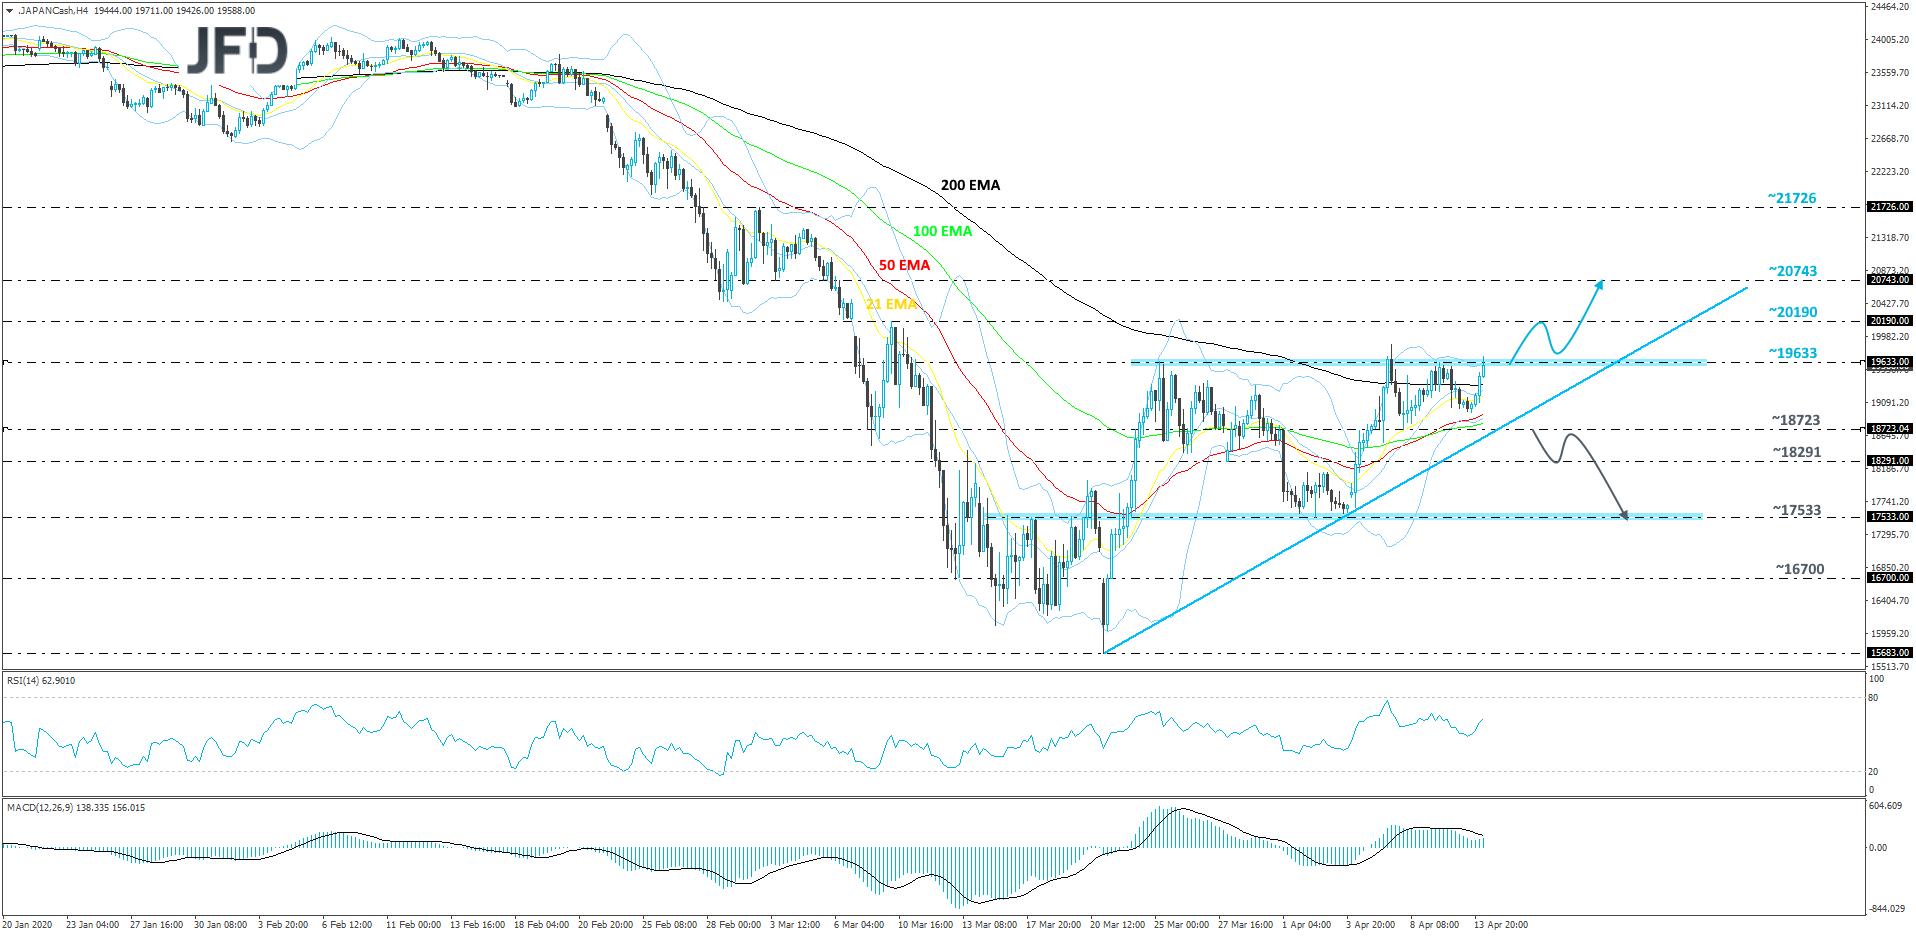 Japan Nikkei 225 cash index 4-hour chart technical analysis